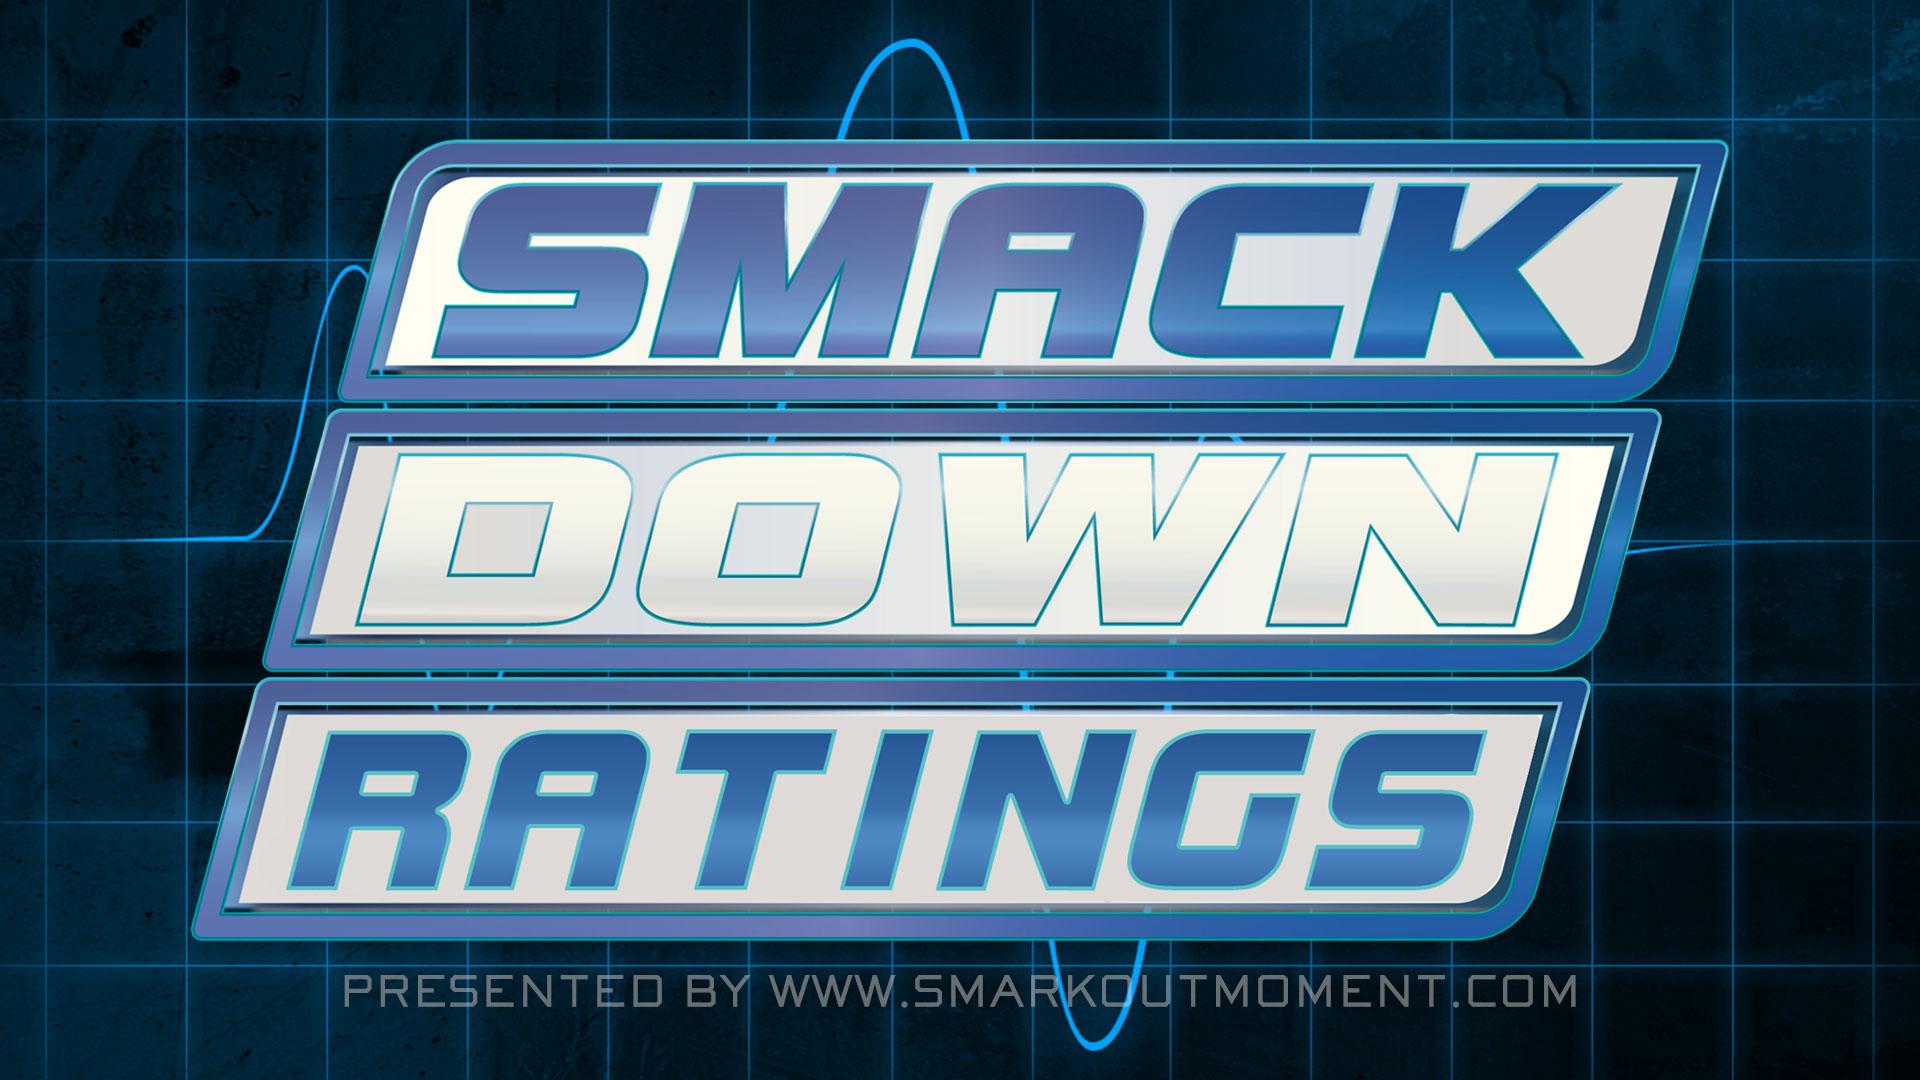 WWE SmackDown TV ratings